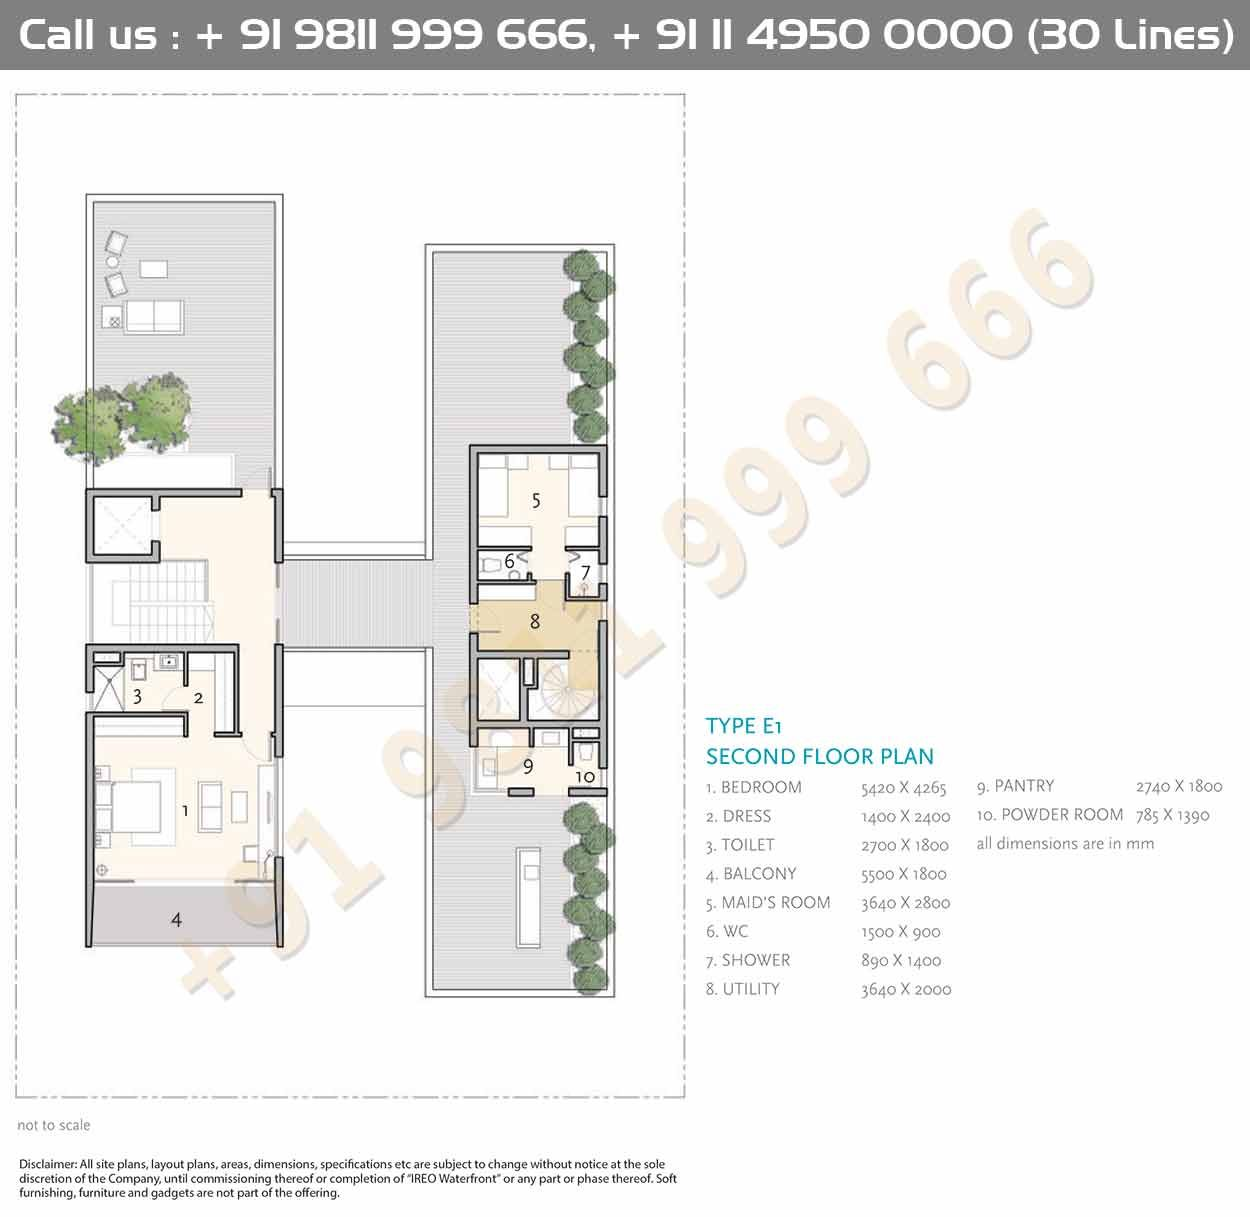 Type E1 Second Floor Plan Floor Plans House Construction Plan Luxury House Designs